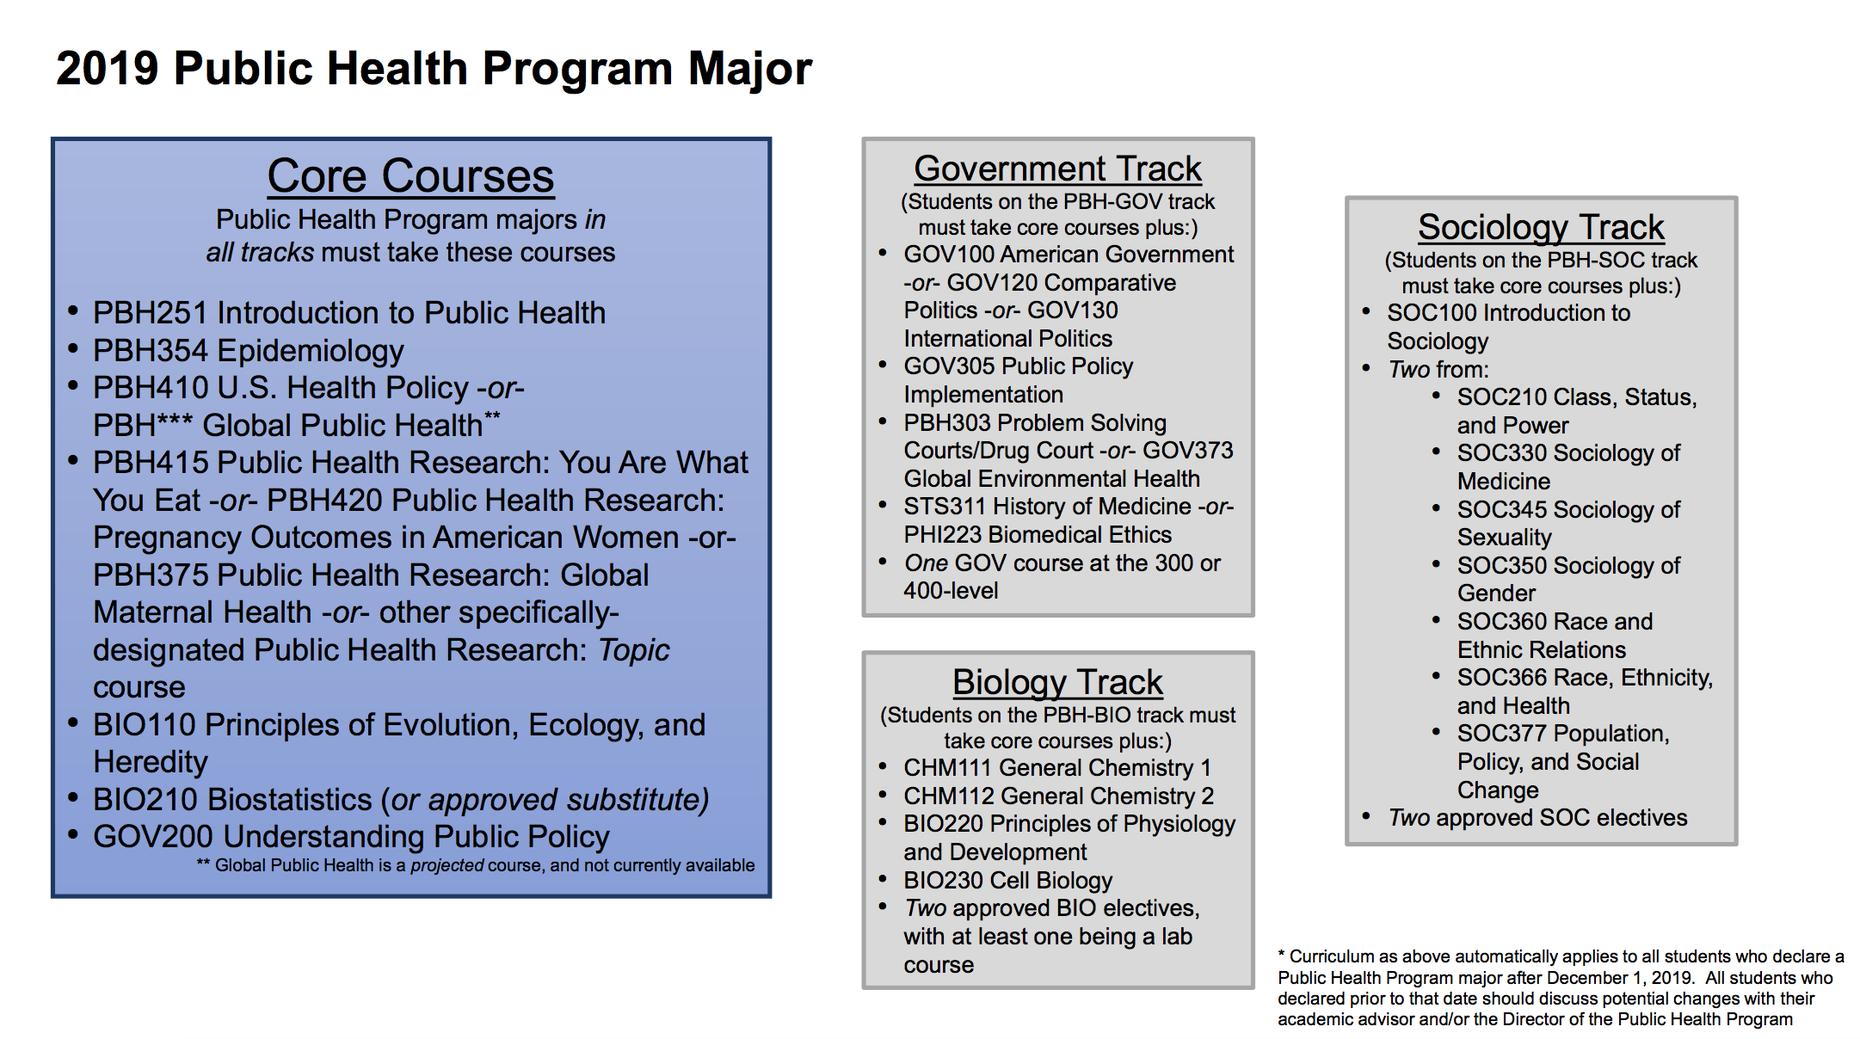 Public Health Program curriculum effective December 1, 2019